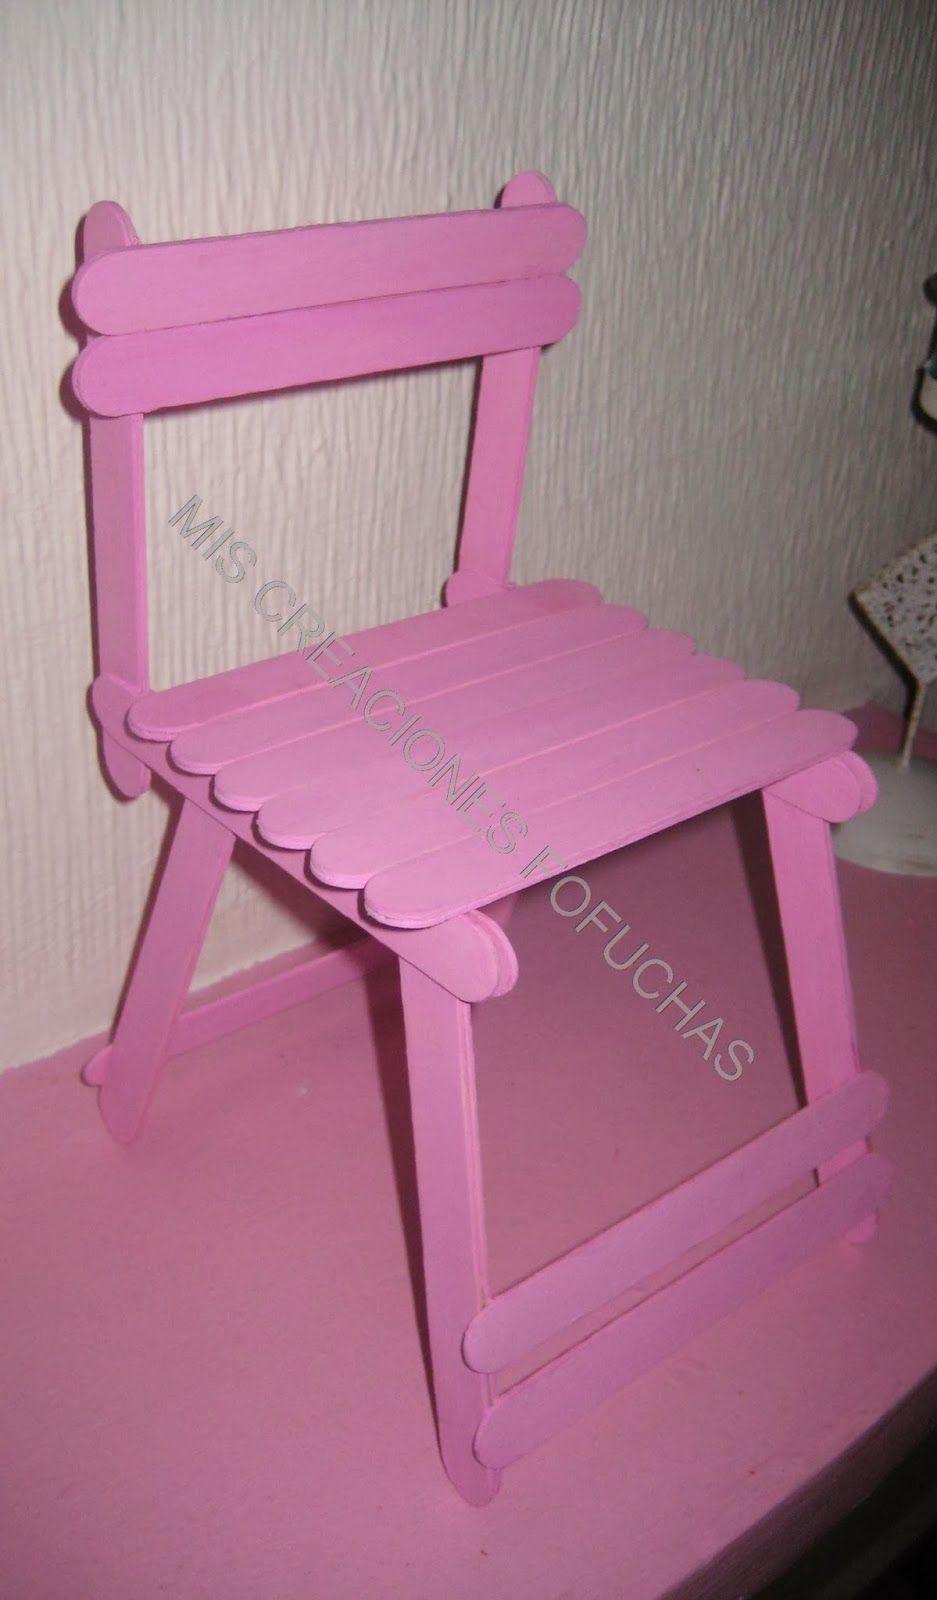 Silla para fofucha fofuchas pinterest sillas goma - Goma espuma para sillas ...